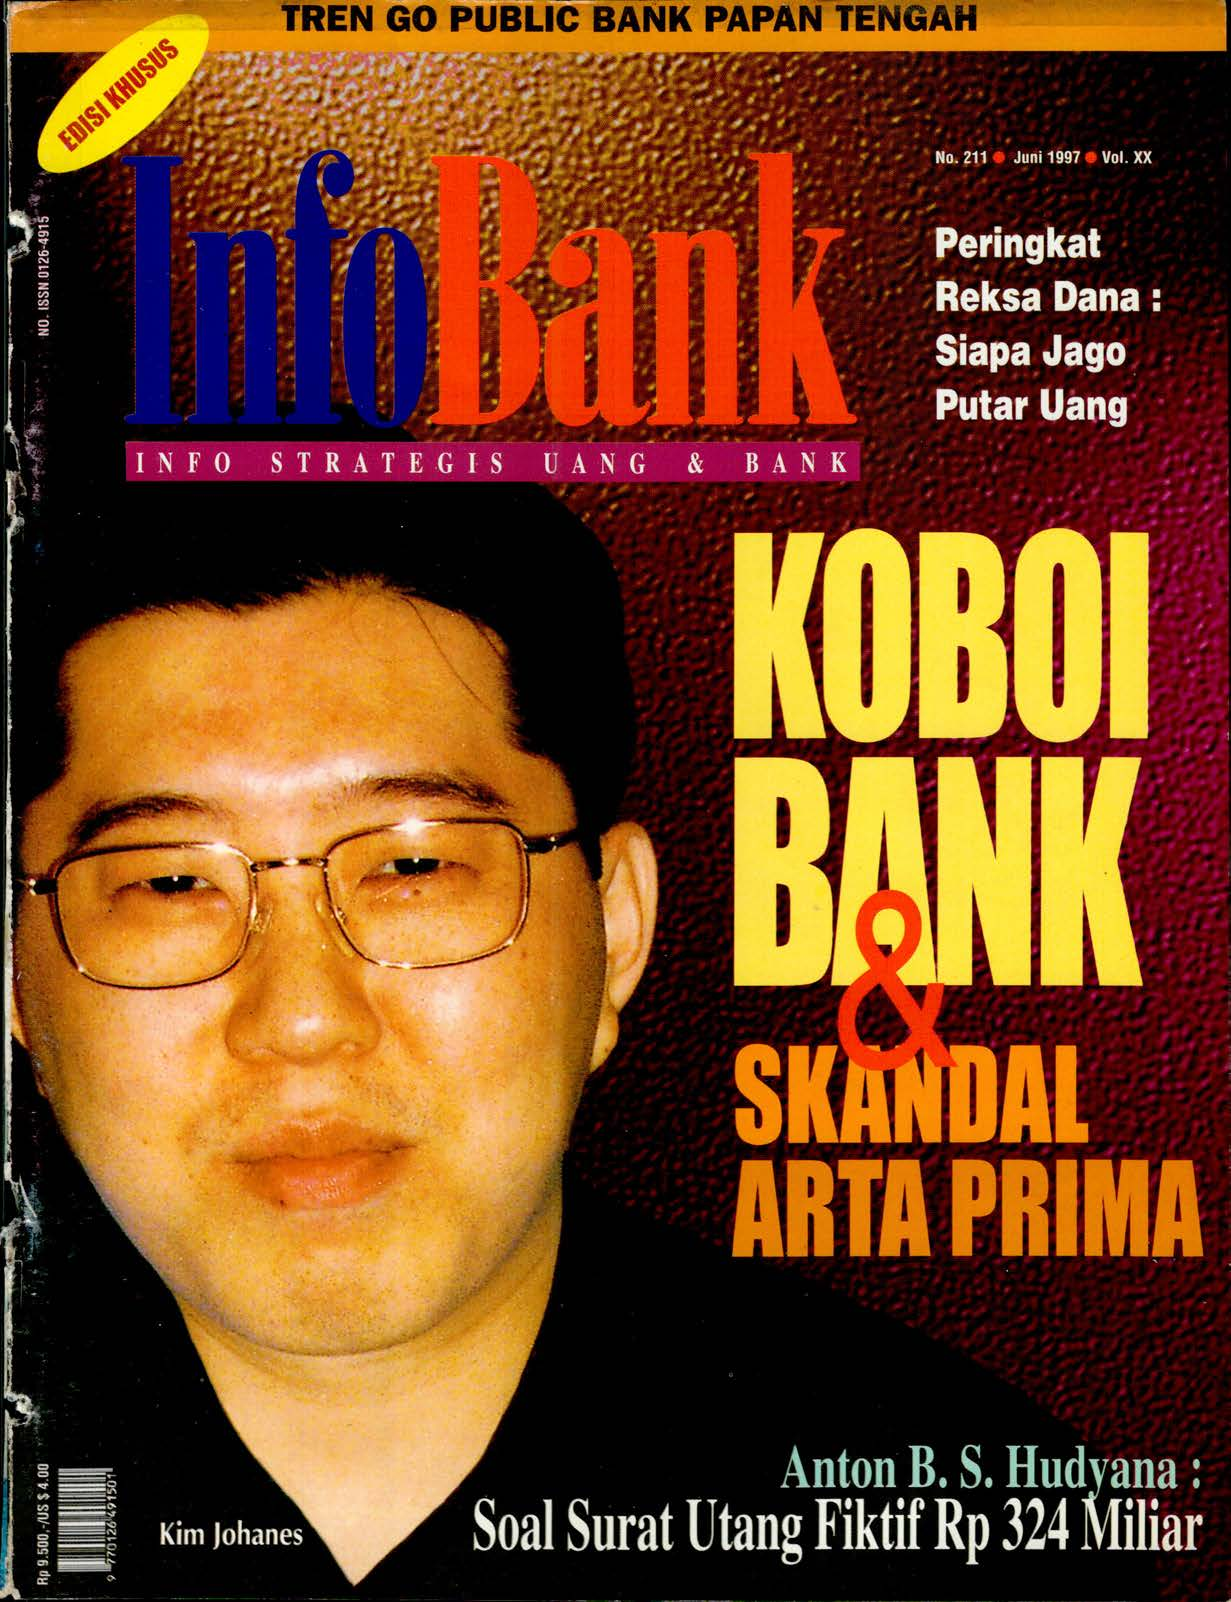 Infobank Edisi Khusus Juni 1997